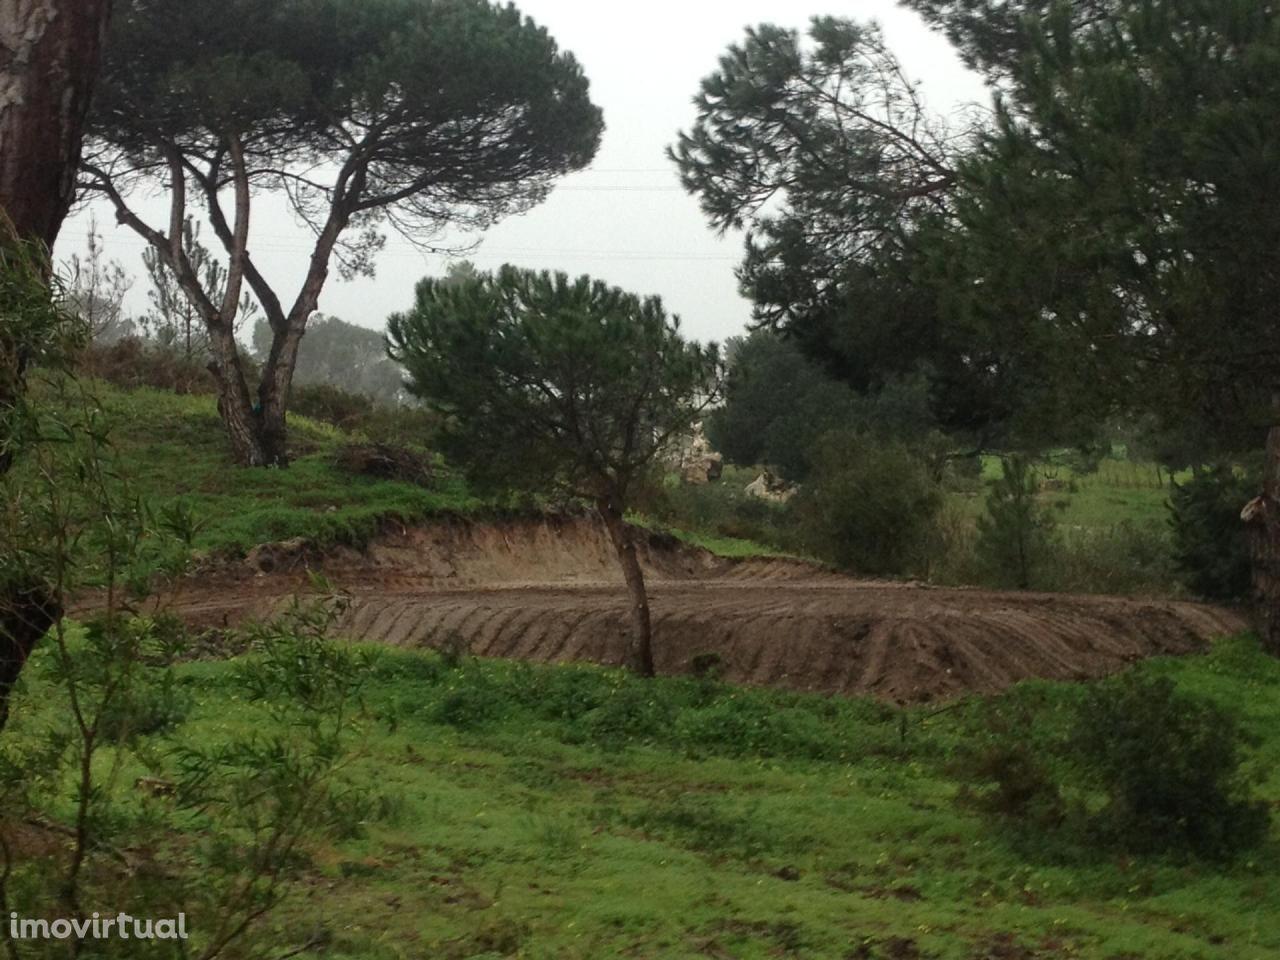 Terreno para comprar, Castelo (Sesimbra), Sesimbra, Setúbal - Foto 18